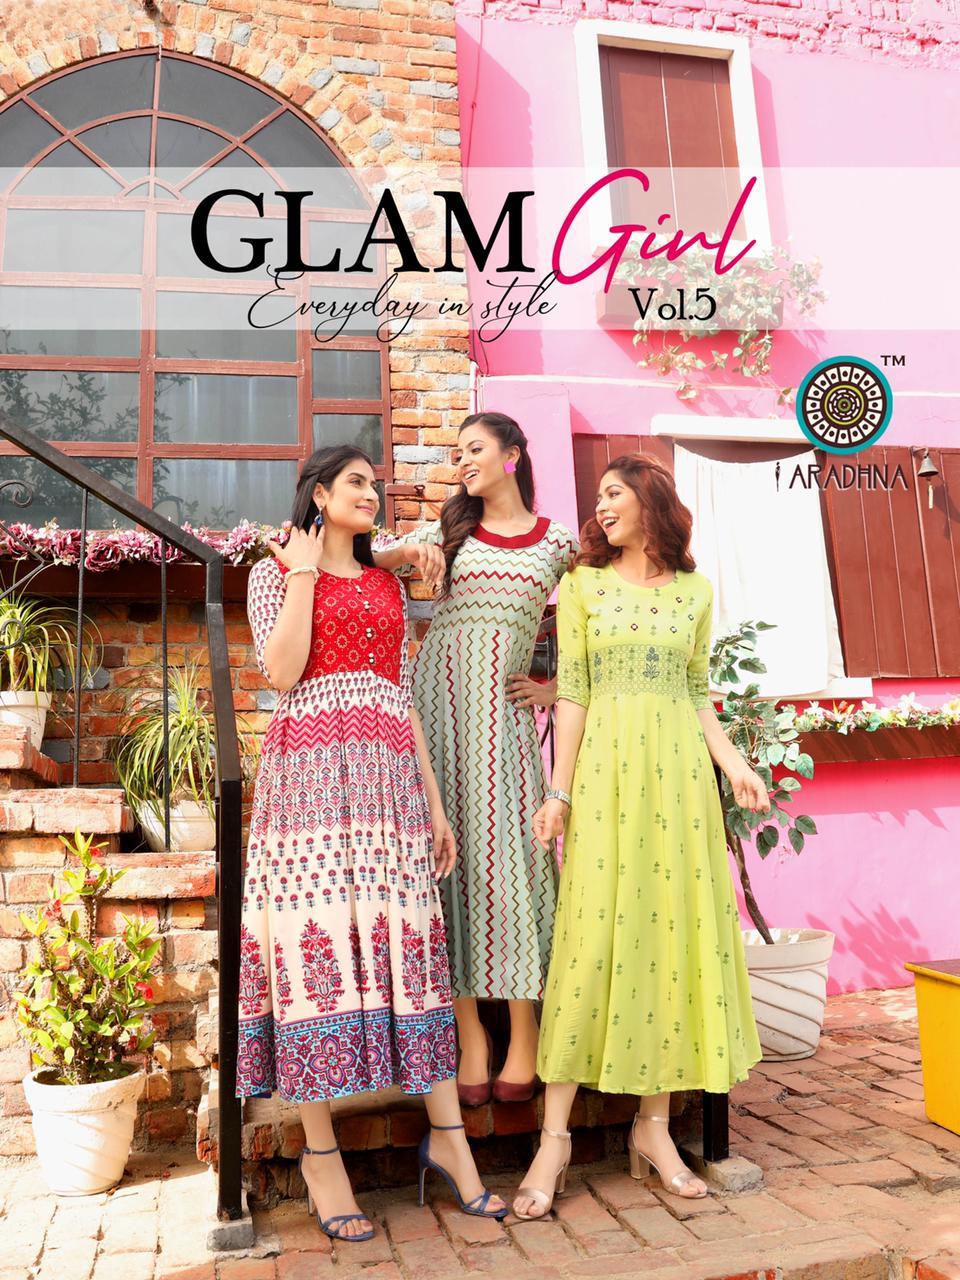 Aradhna Glam Girl Vol 5 Kurti Wholesale Catalog 12 Pcs 17 - Aradhna Glam Girl Vol 5 Kurti Wholesale Catalog 12 Pcs